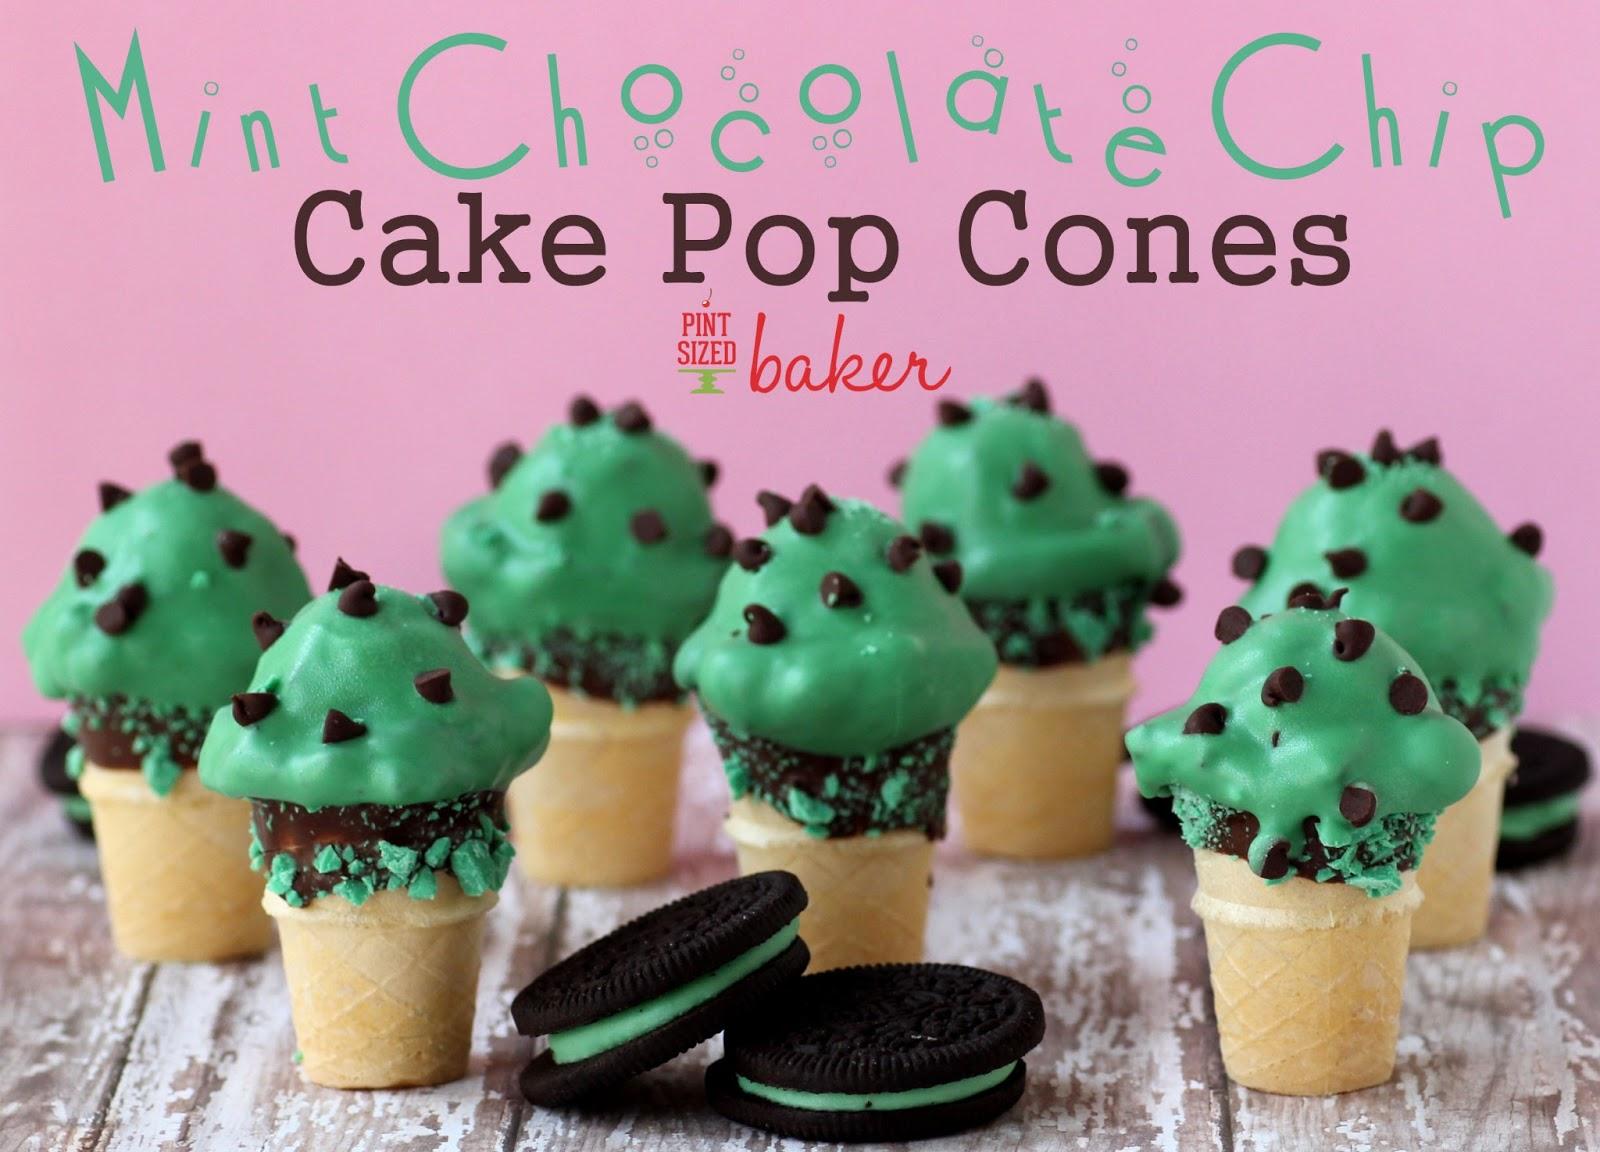 Chocolate chocolate chip cake pops